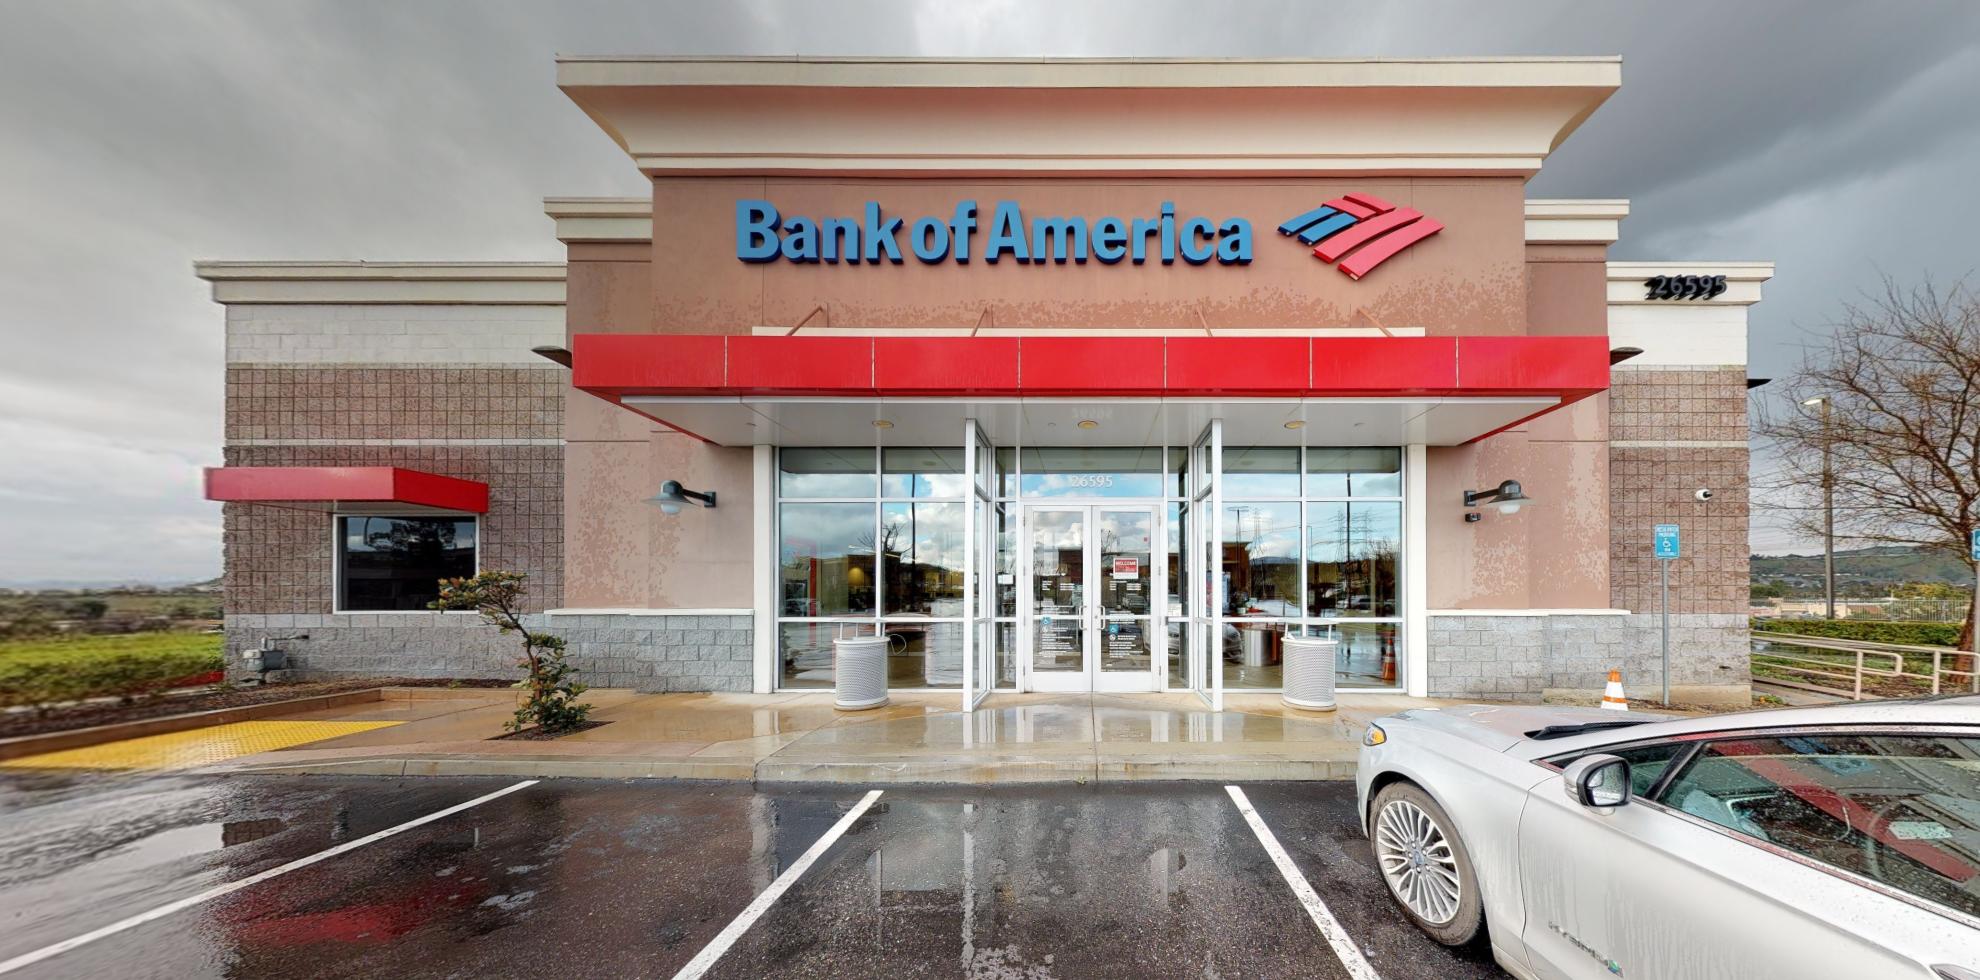 Bank of America financial center with drive-thru ATM   26595 Golden Valley Rd, Santa Clarita, CA 91350